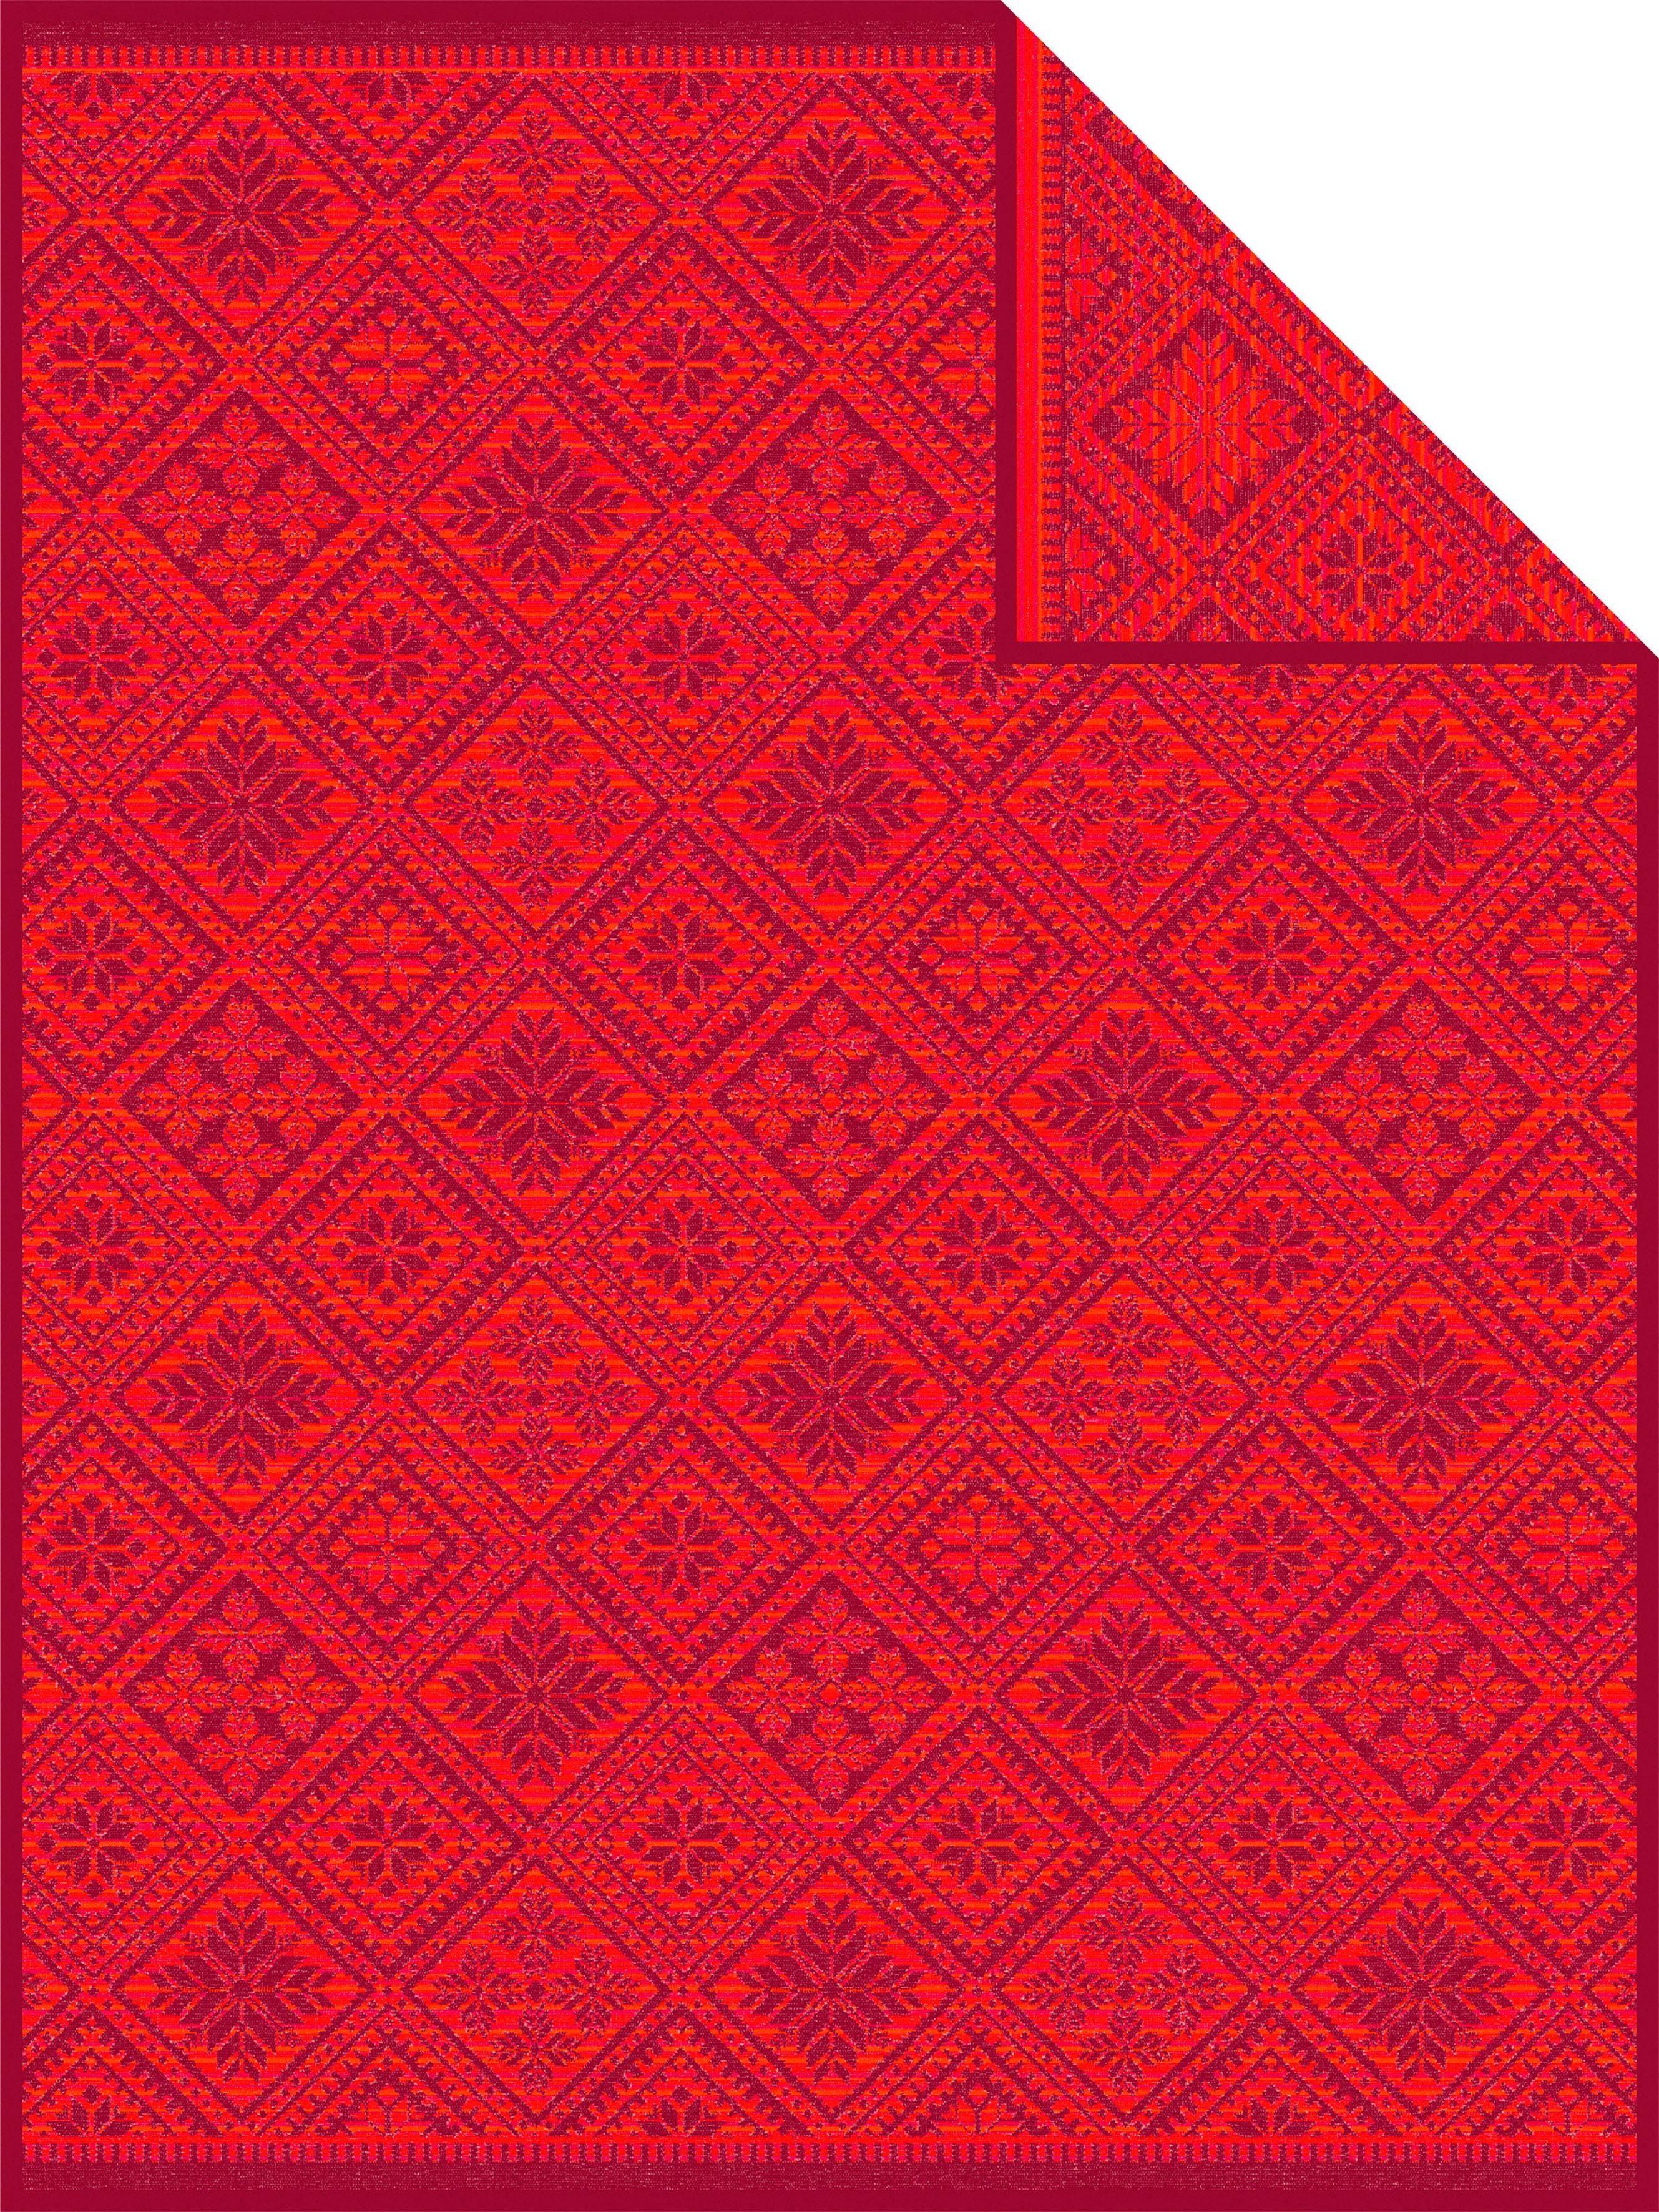 Wohndecke »Marcala«, IBENA, mit Muster